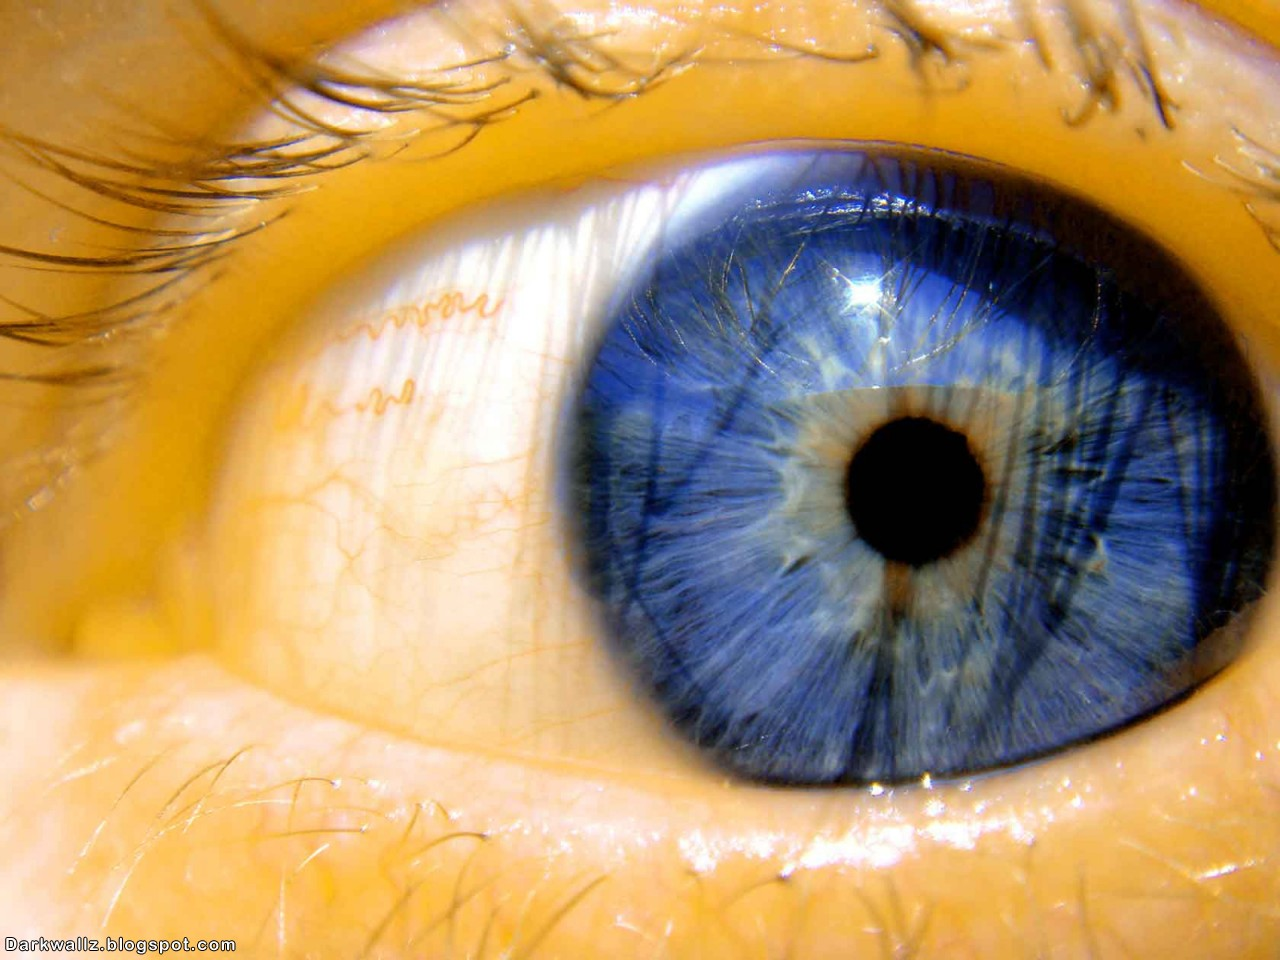 Photograf creepy wallpapers - Scary yellow eyes ...